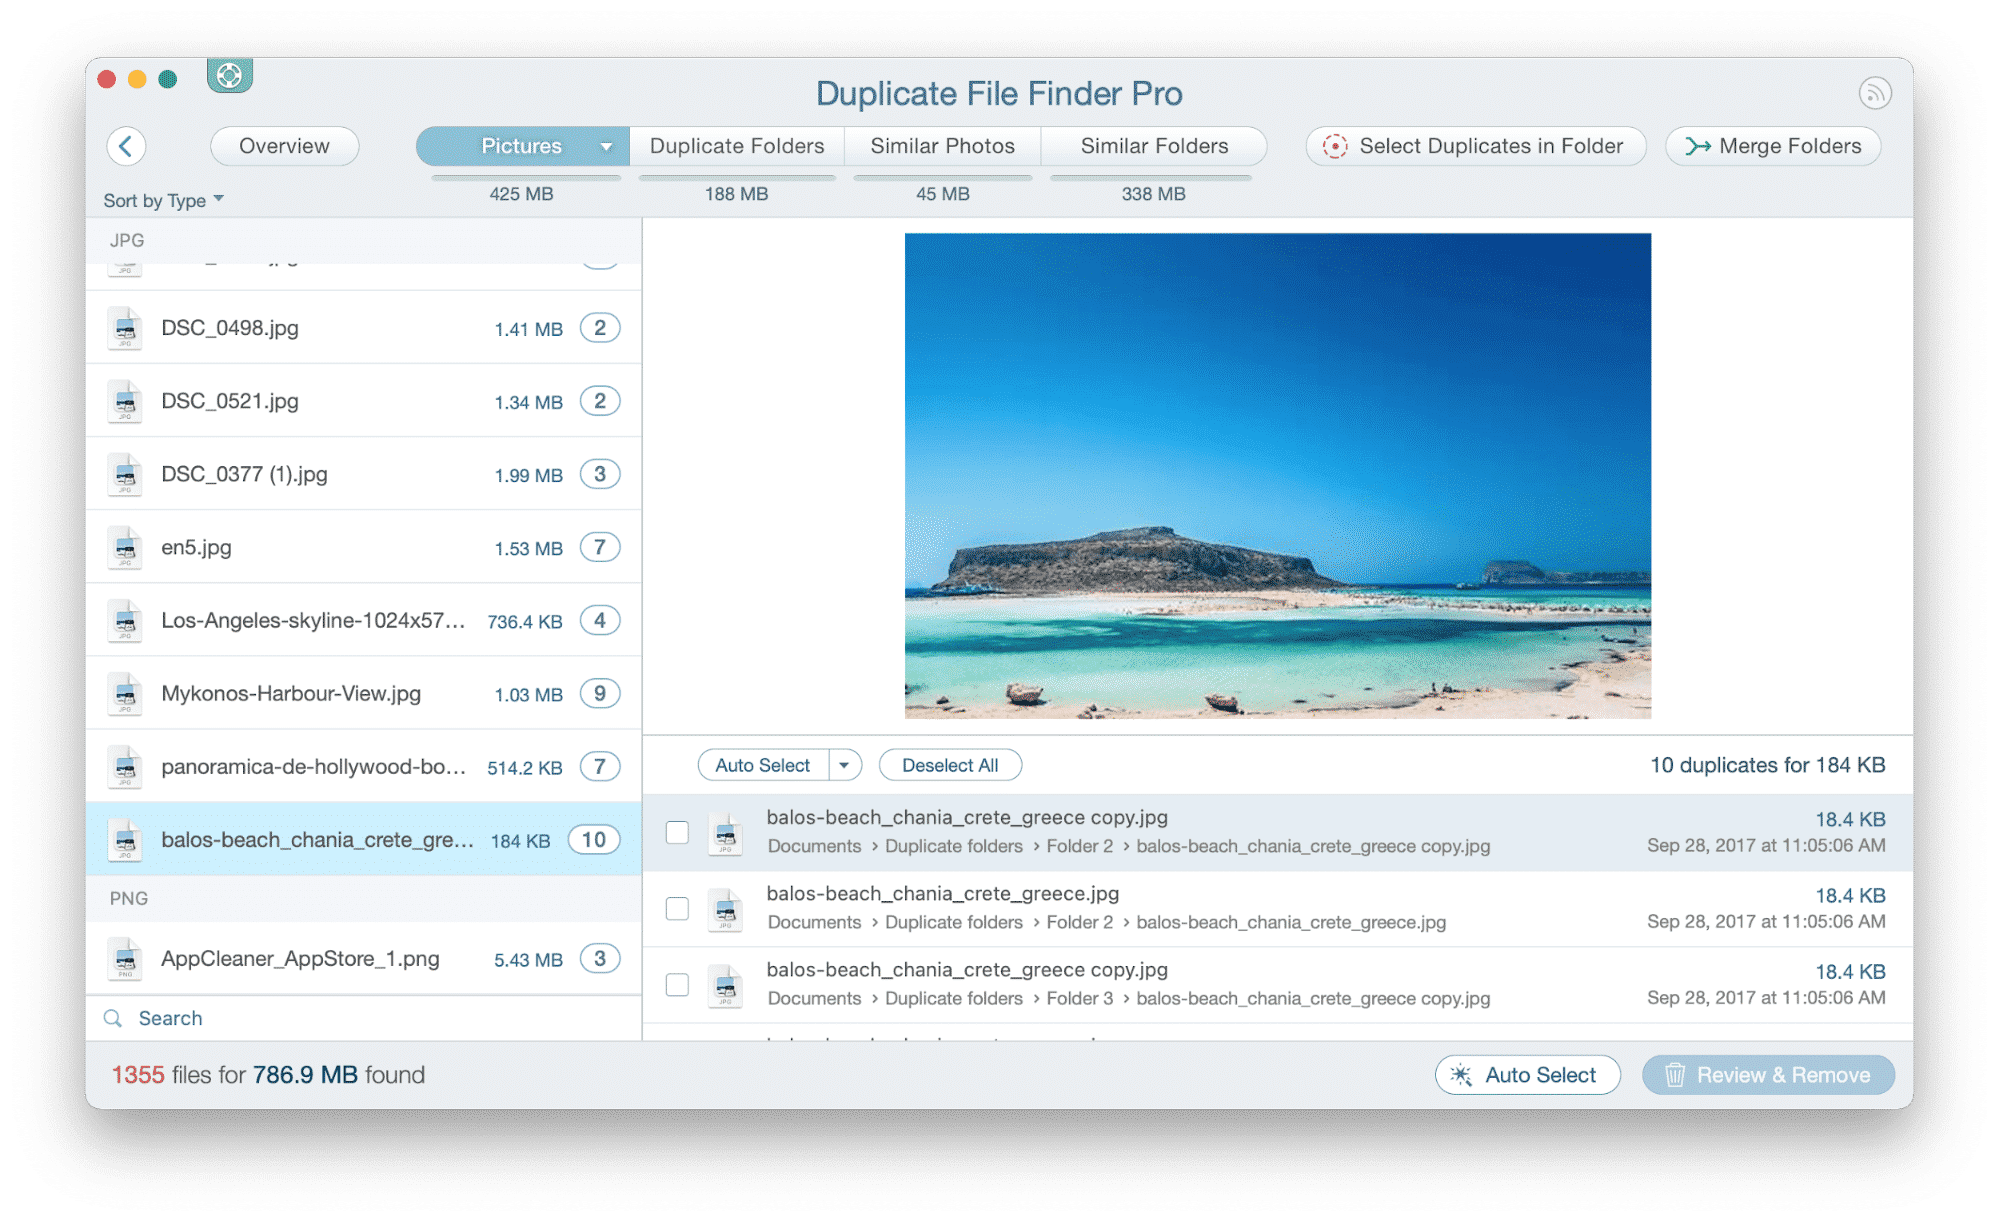 Duplicate File Finder window